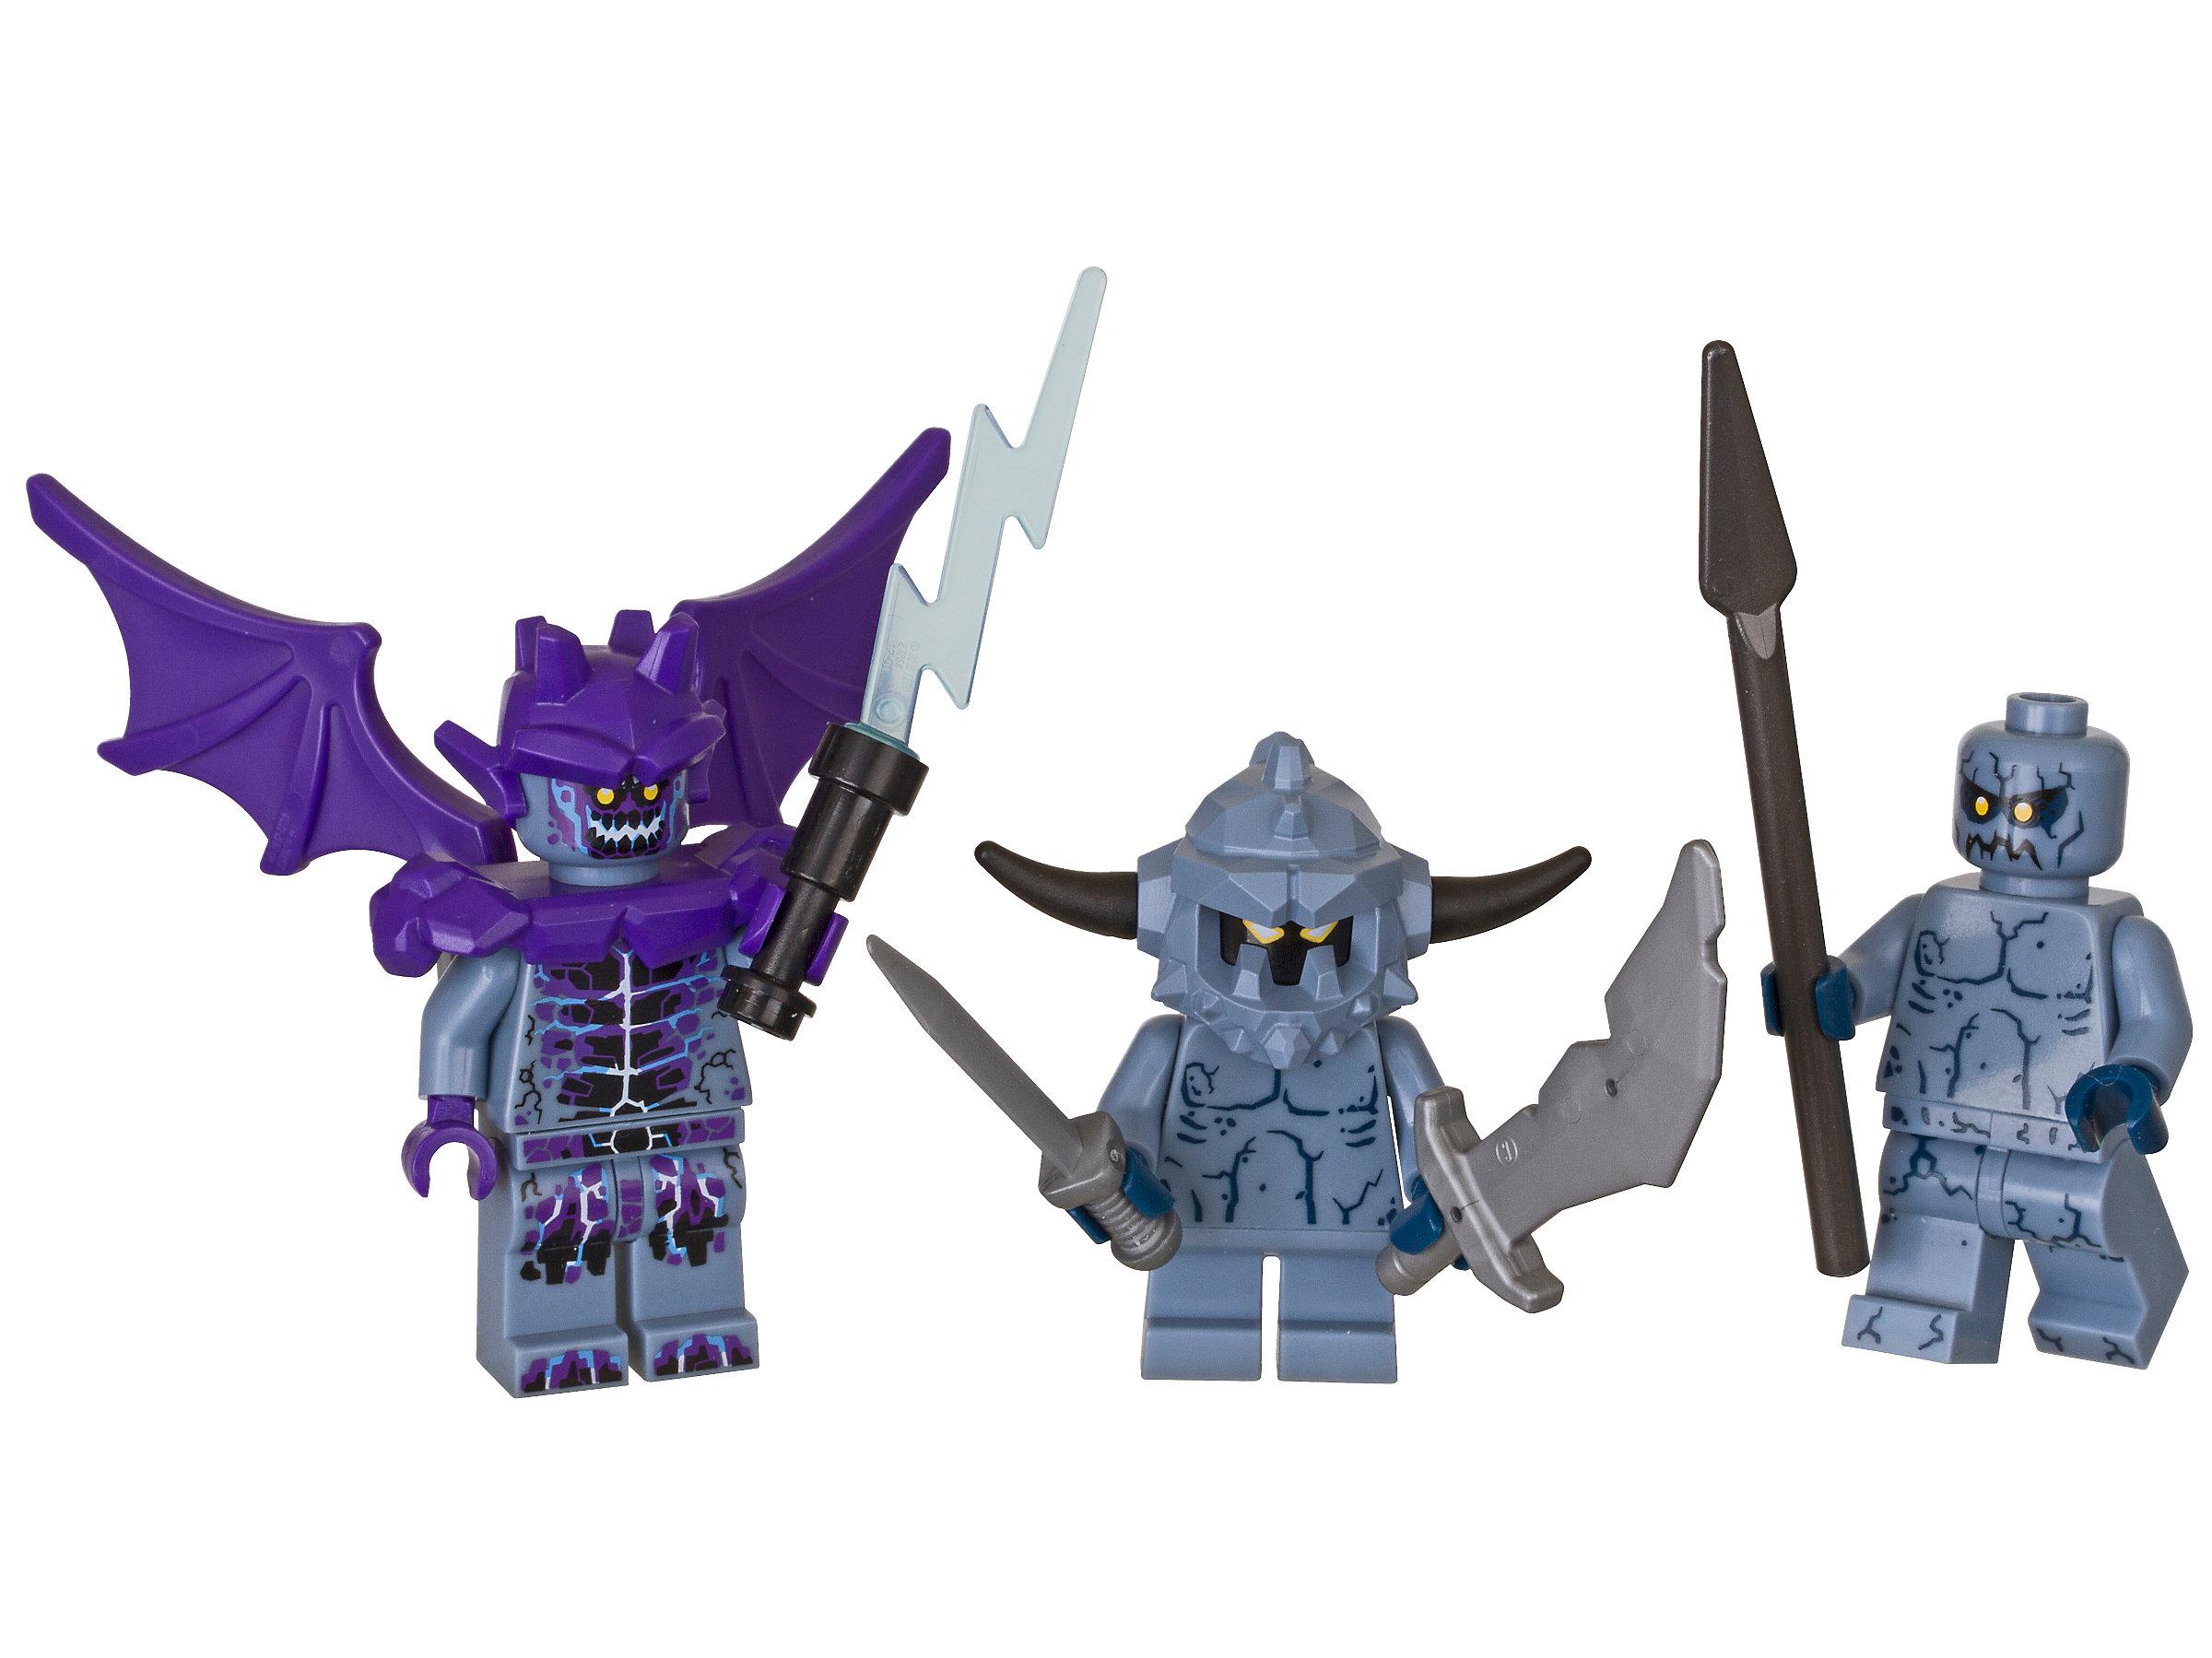 Nexo Nexo Knights Lego® Lego® Lego® Knights 4Rq5AjL3